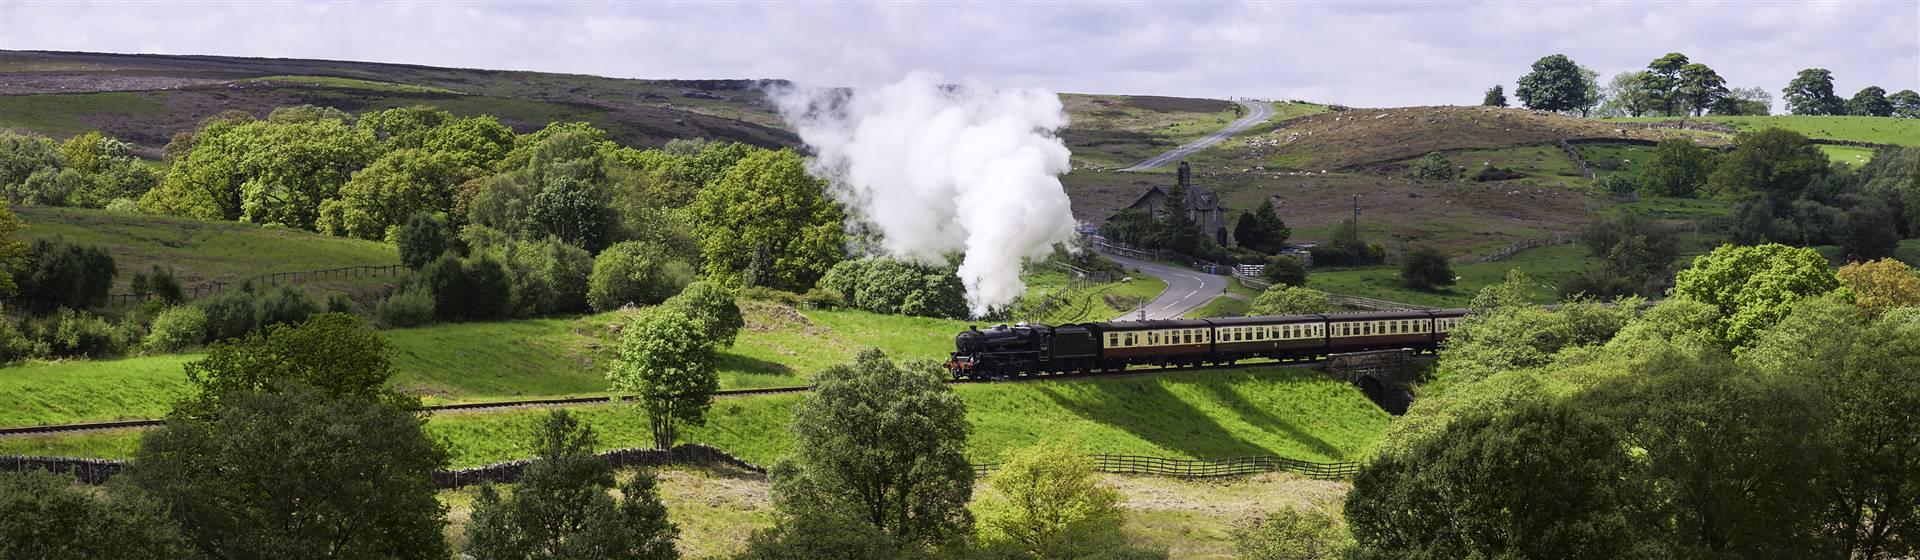 North Yorkshire Sail & Steam